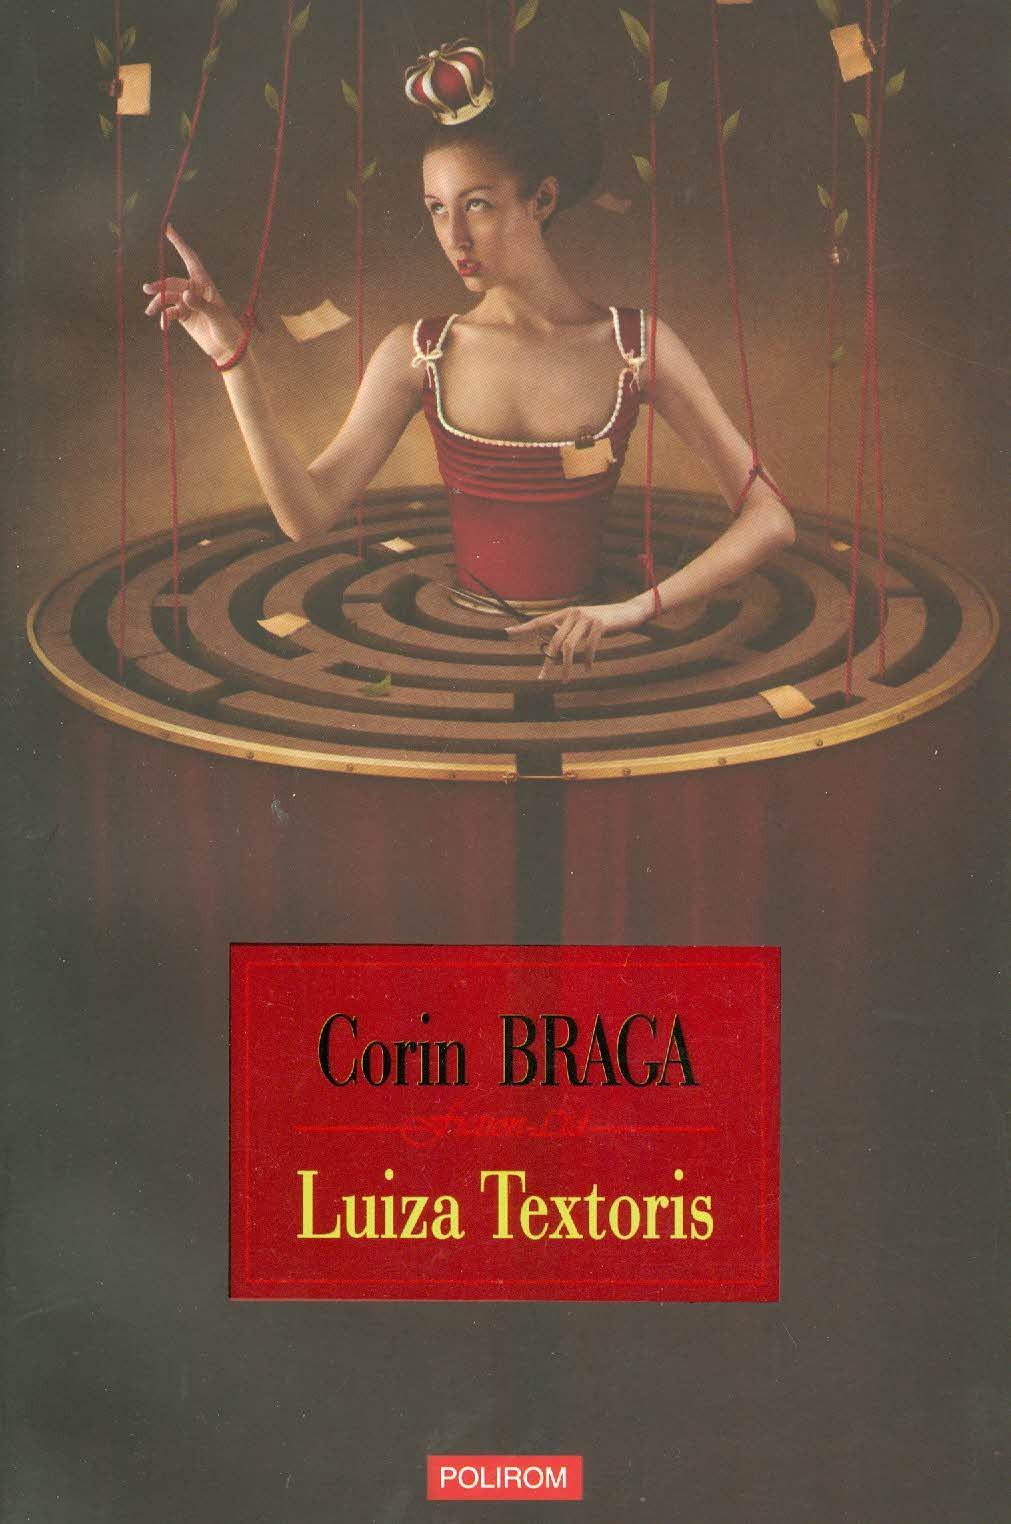 Corin-Braga__Luiza-Textoris__973-46-2899-5-785334228144